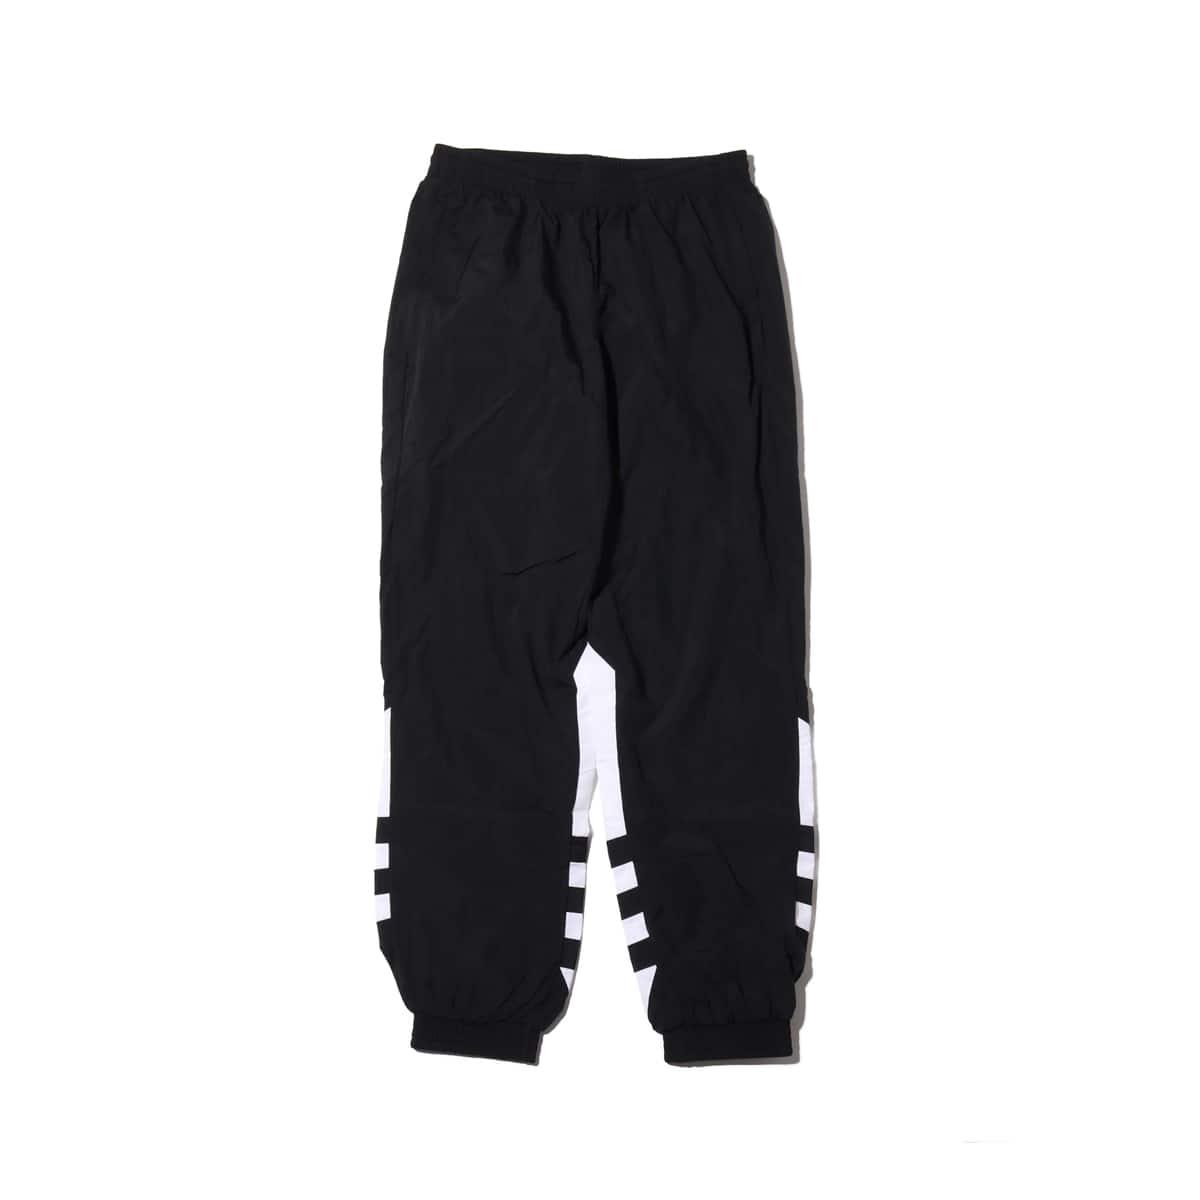 adidas BIG TREFOIL TRACK PANTS MEN BLACK 20SS-I_photo_large